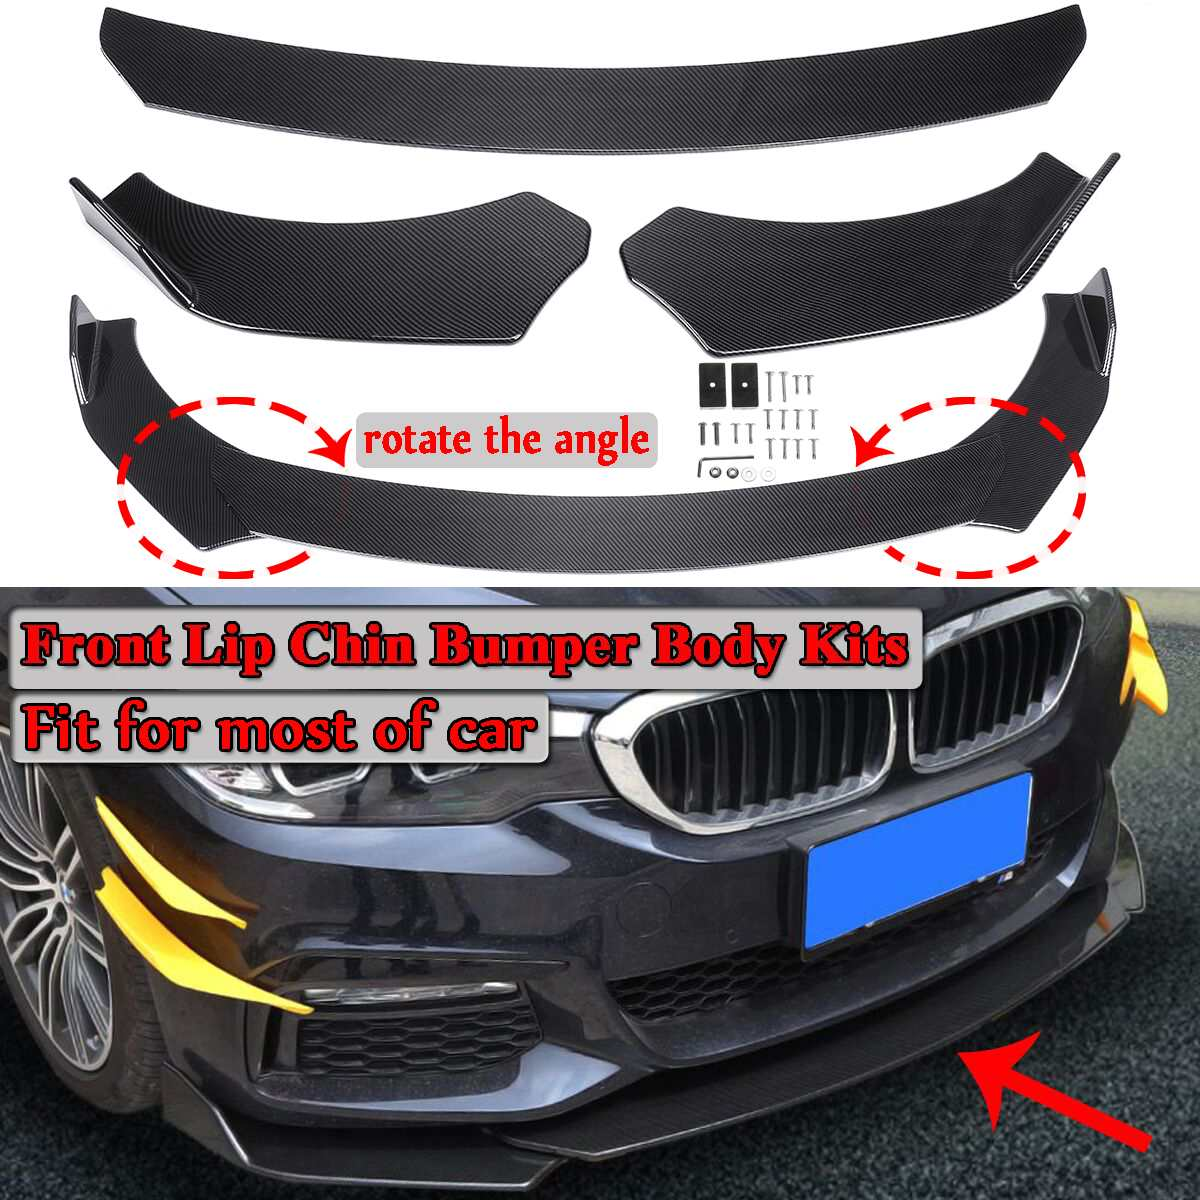 Aspecto de fibra de carbono/Negro 3 piezas Universal parachoques delantero del coche labio barbilla parachoques cuerpo Kits divisor difusor para BMW para Benz para Audi